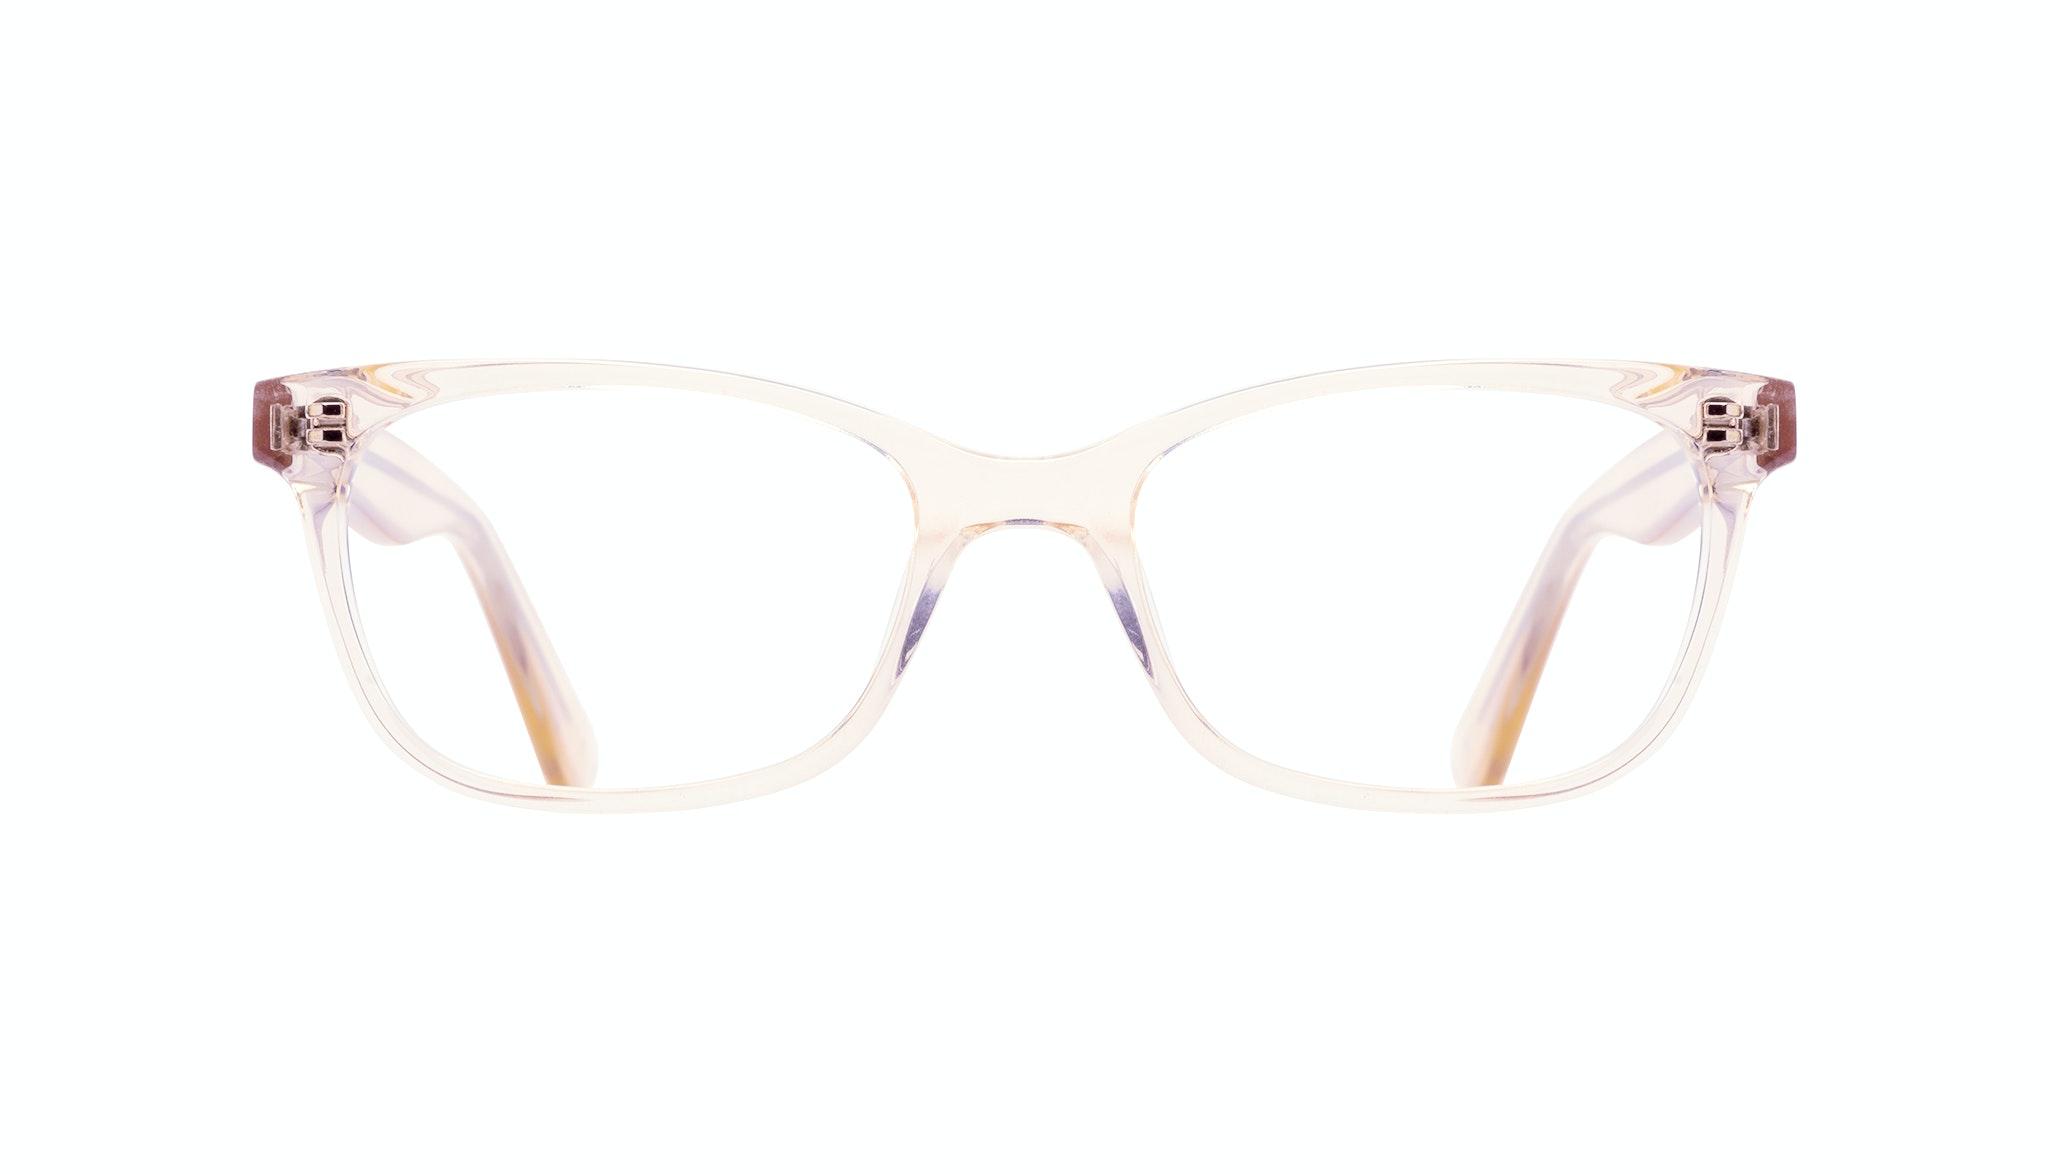 Affordable Fashion Glasses Cat Eye Rectangle Square Eyeglasses Women Comet Blond Front